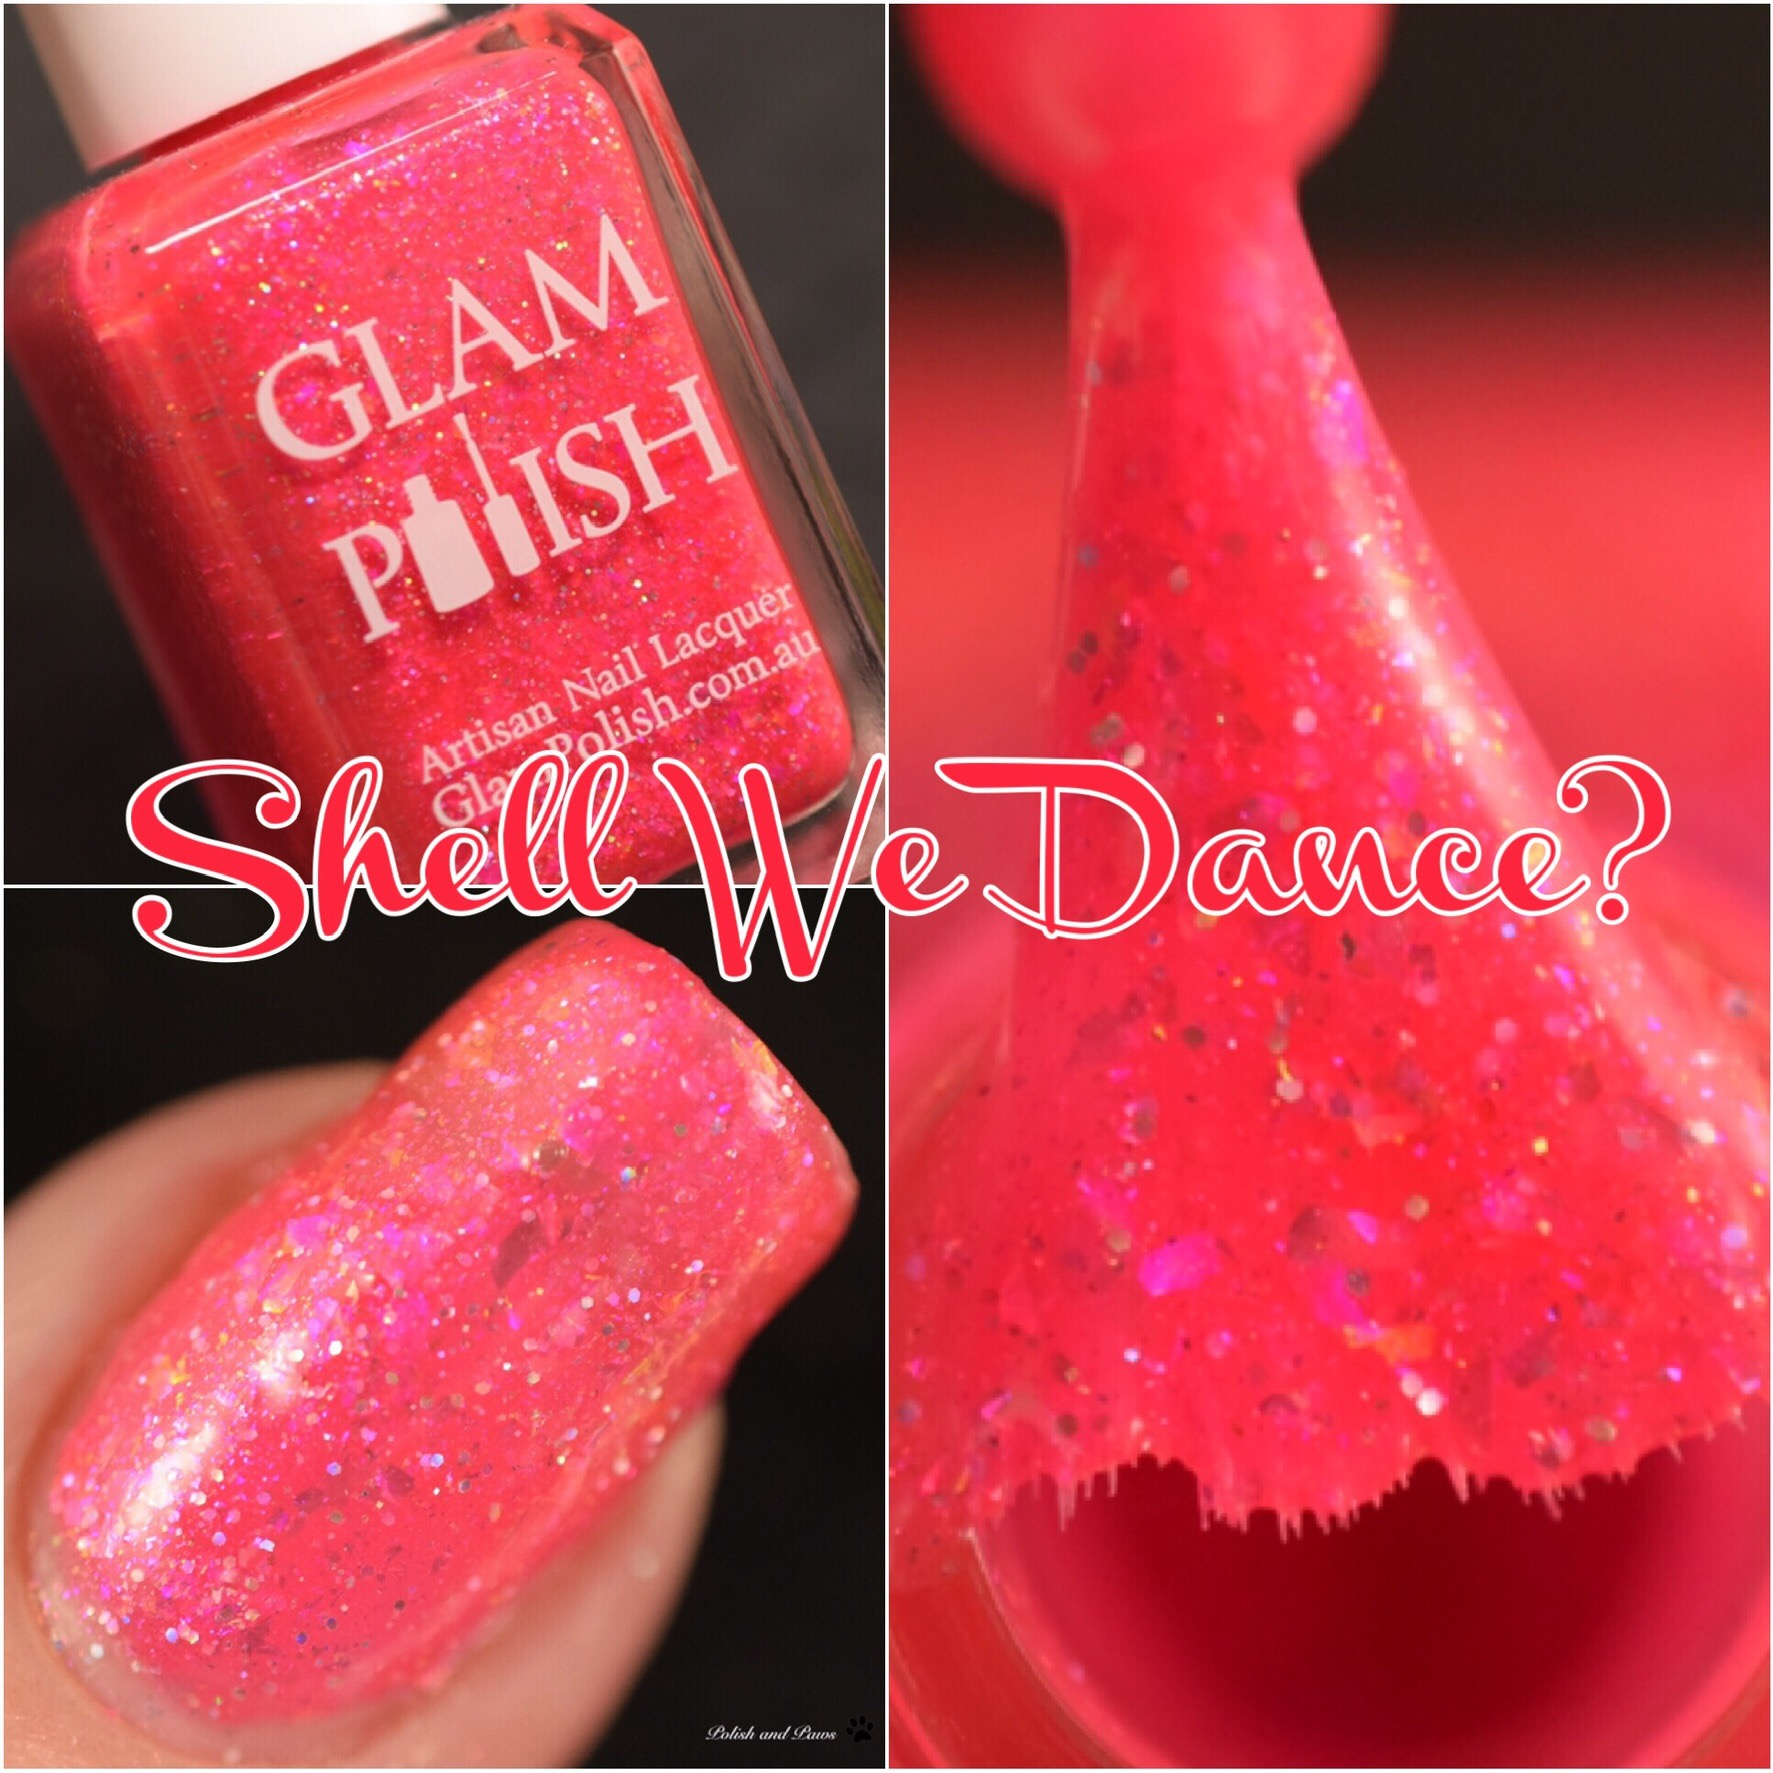 Glam Polish Shell We Dance?